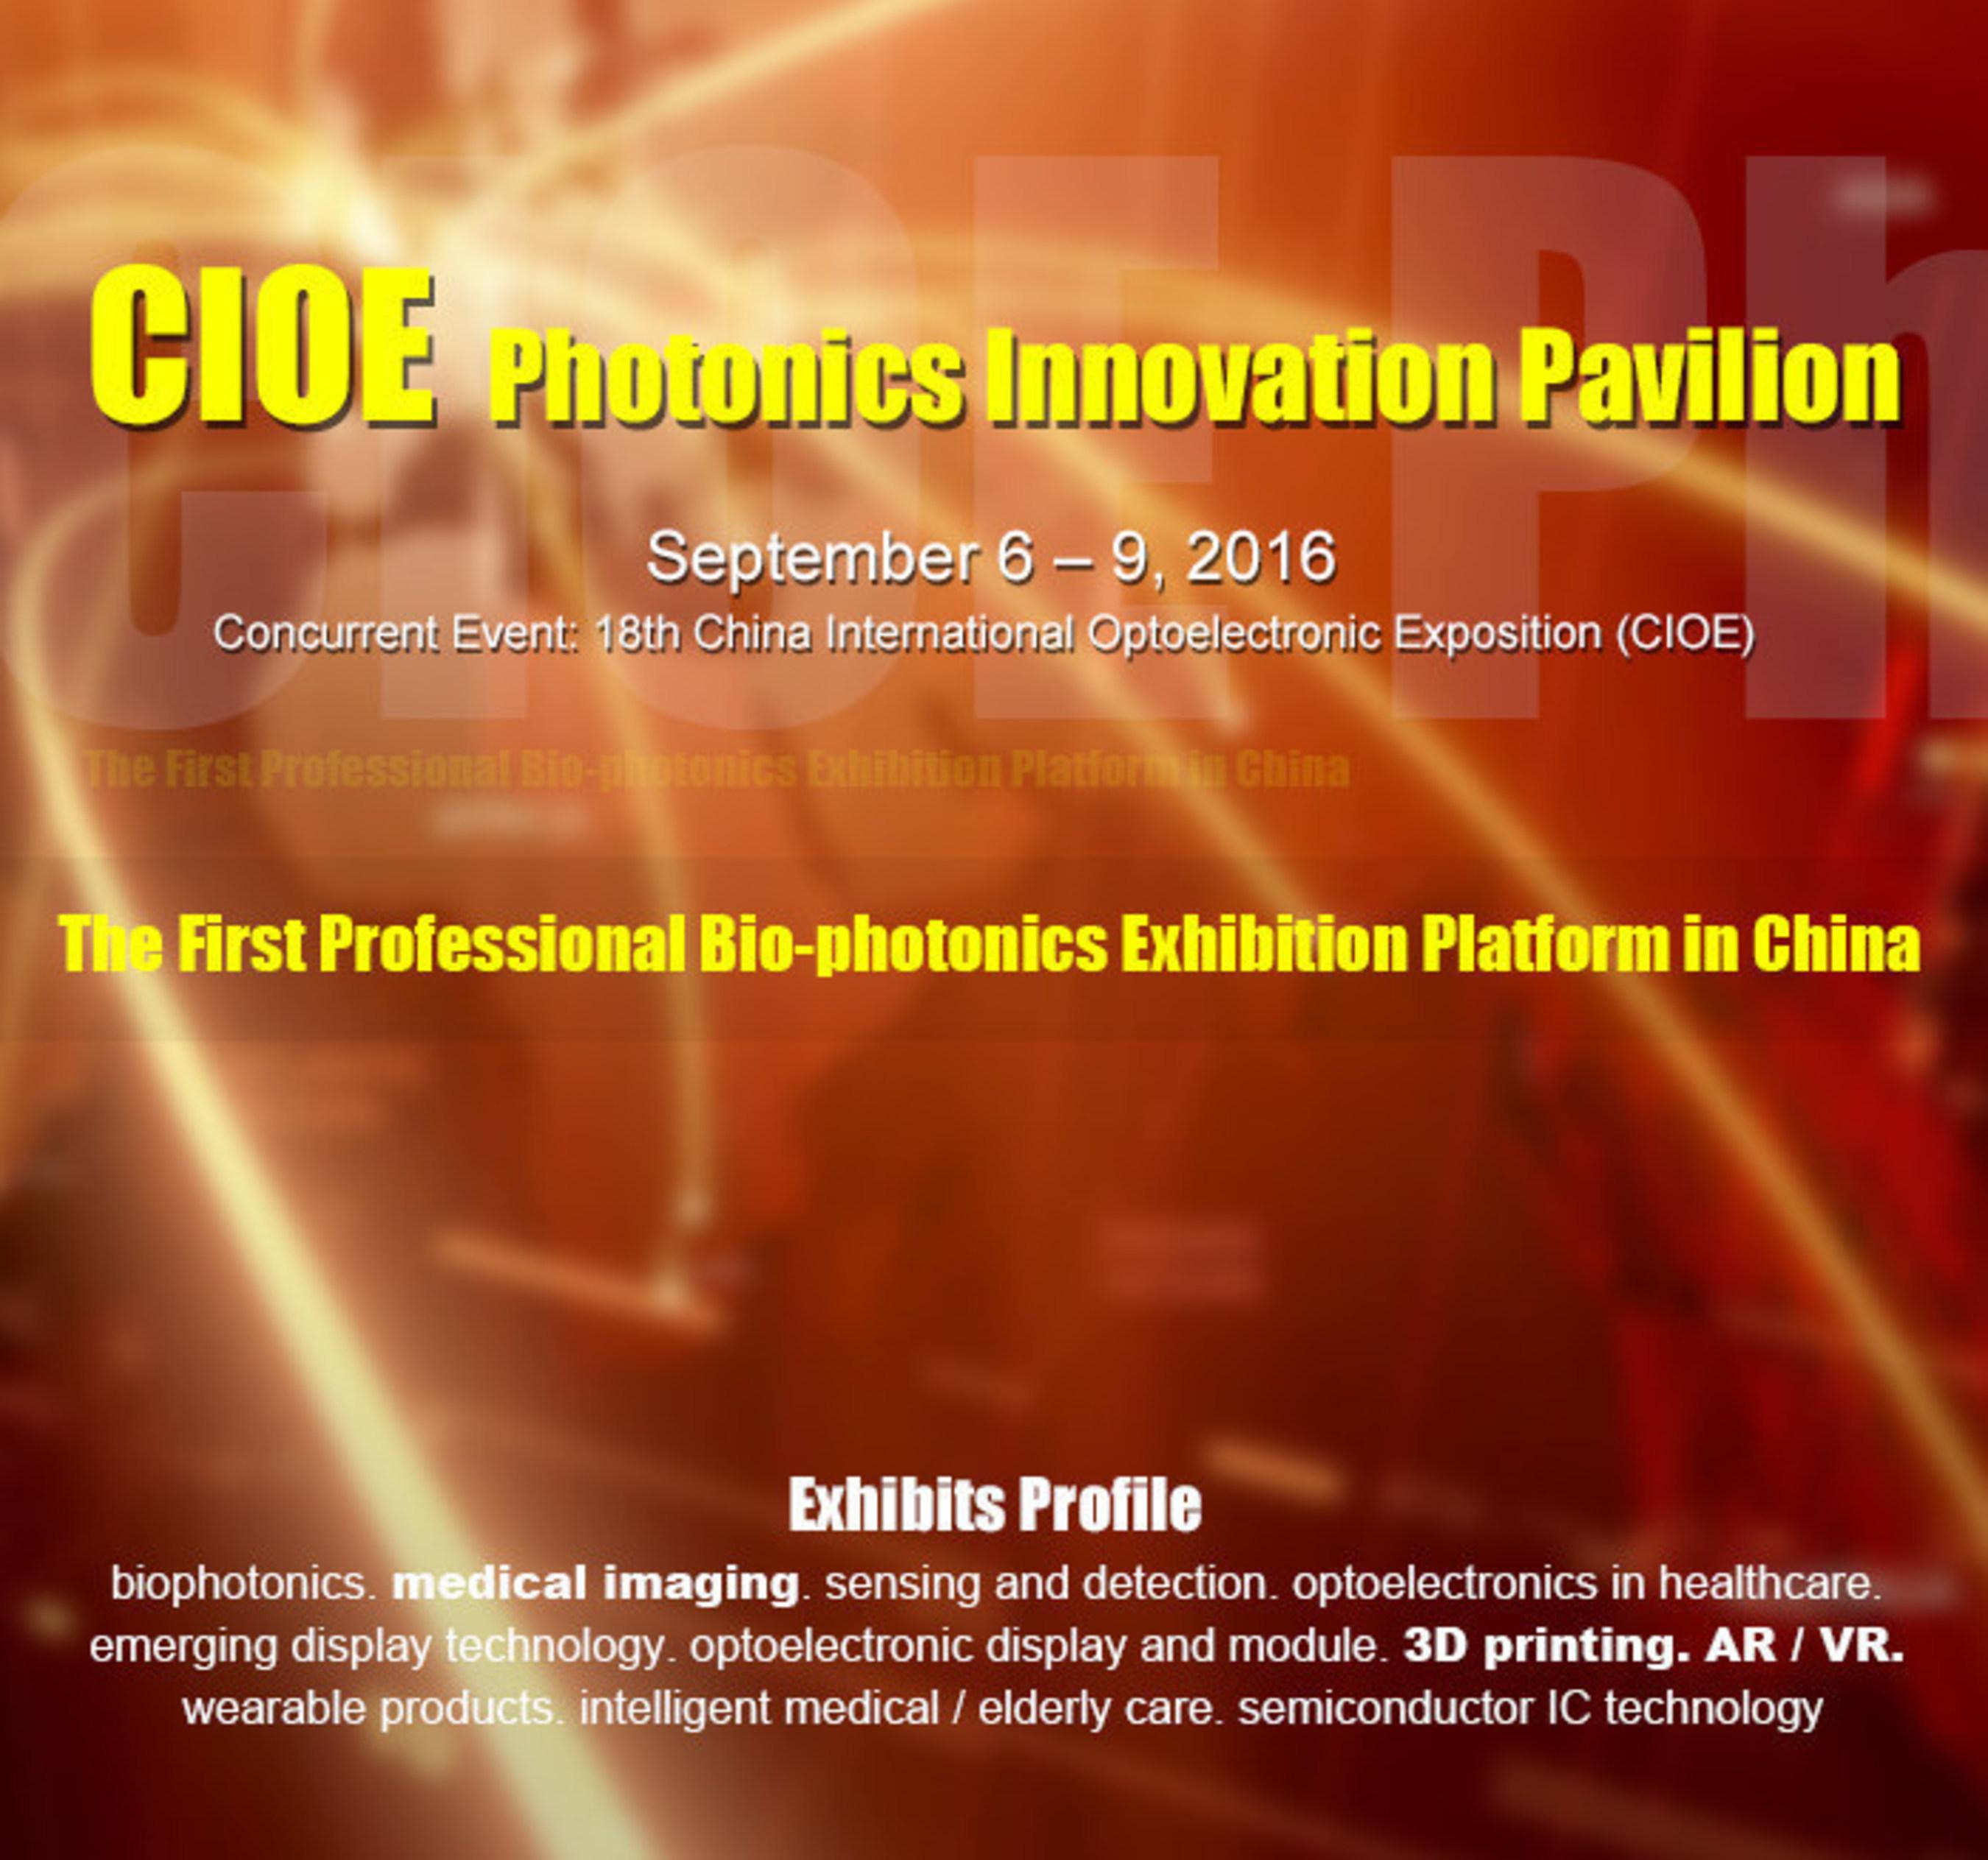 CIOE photonics innovation pavilion